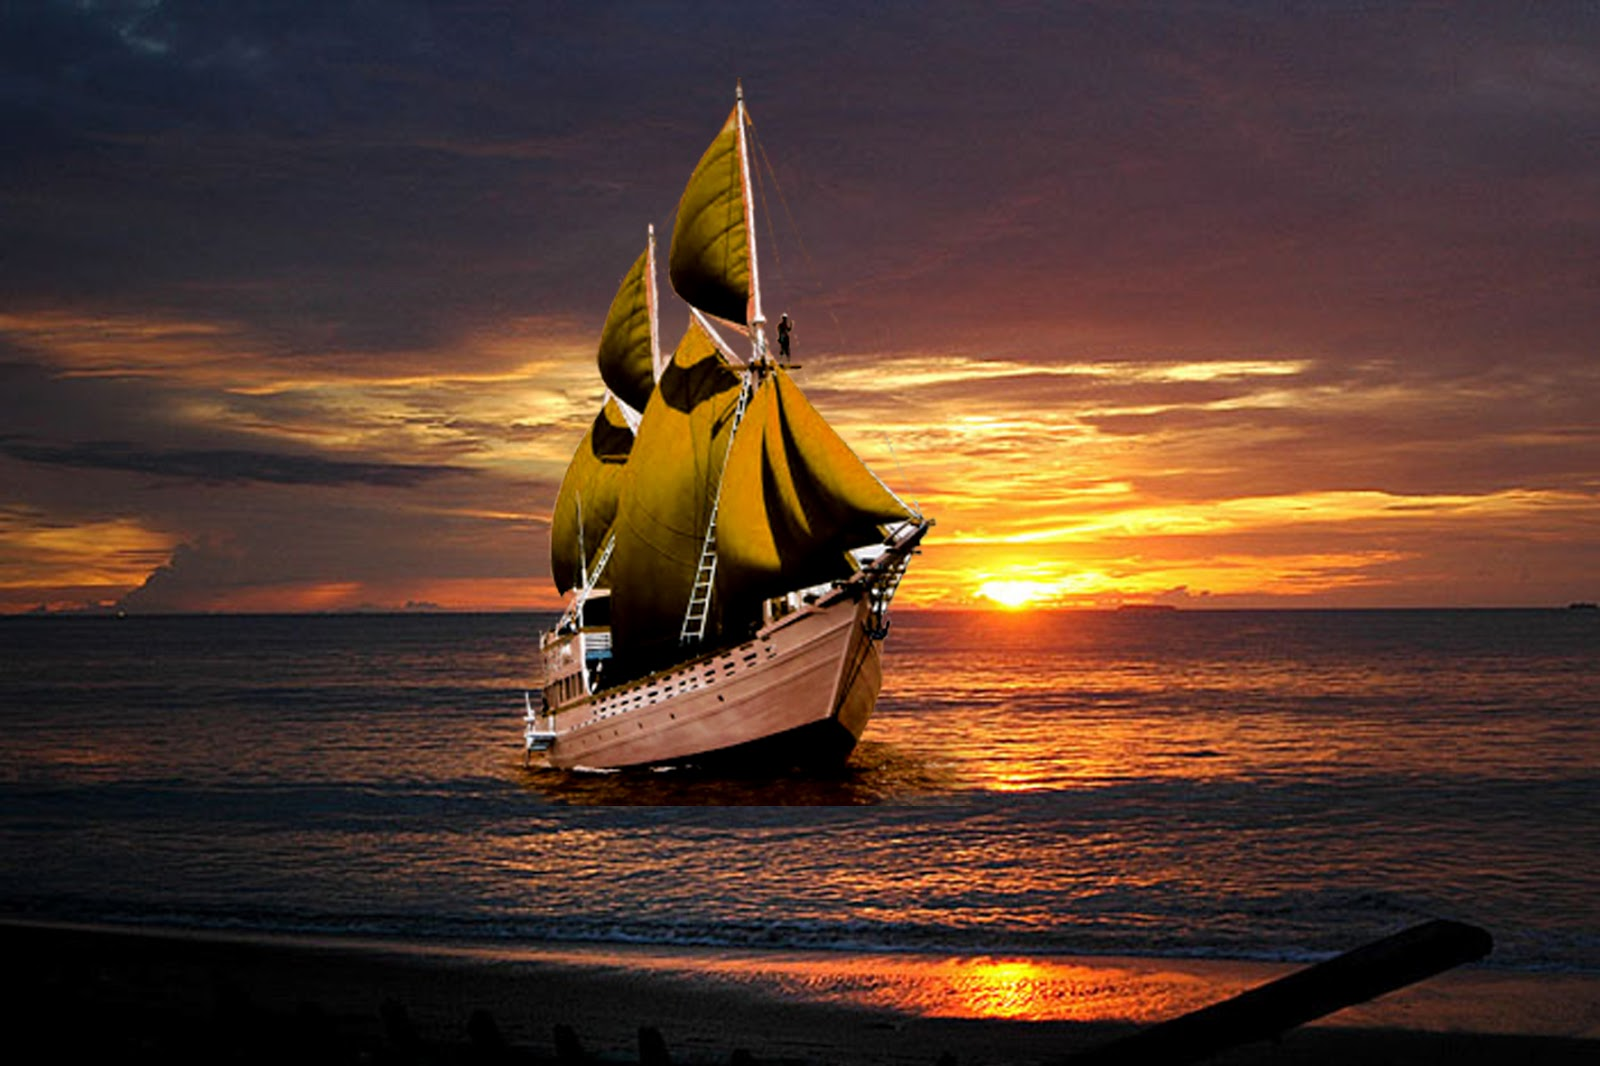 Love Wallpaper Kapal : Kita Adalah Kapal-Kapal yang Berlayar - Kapal Layar